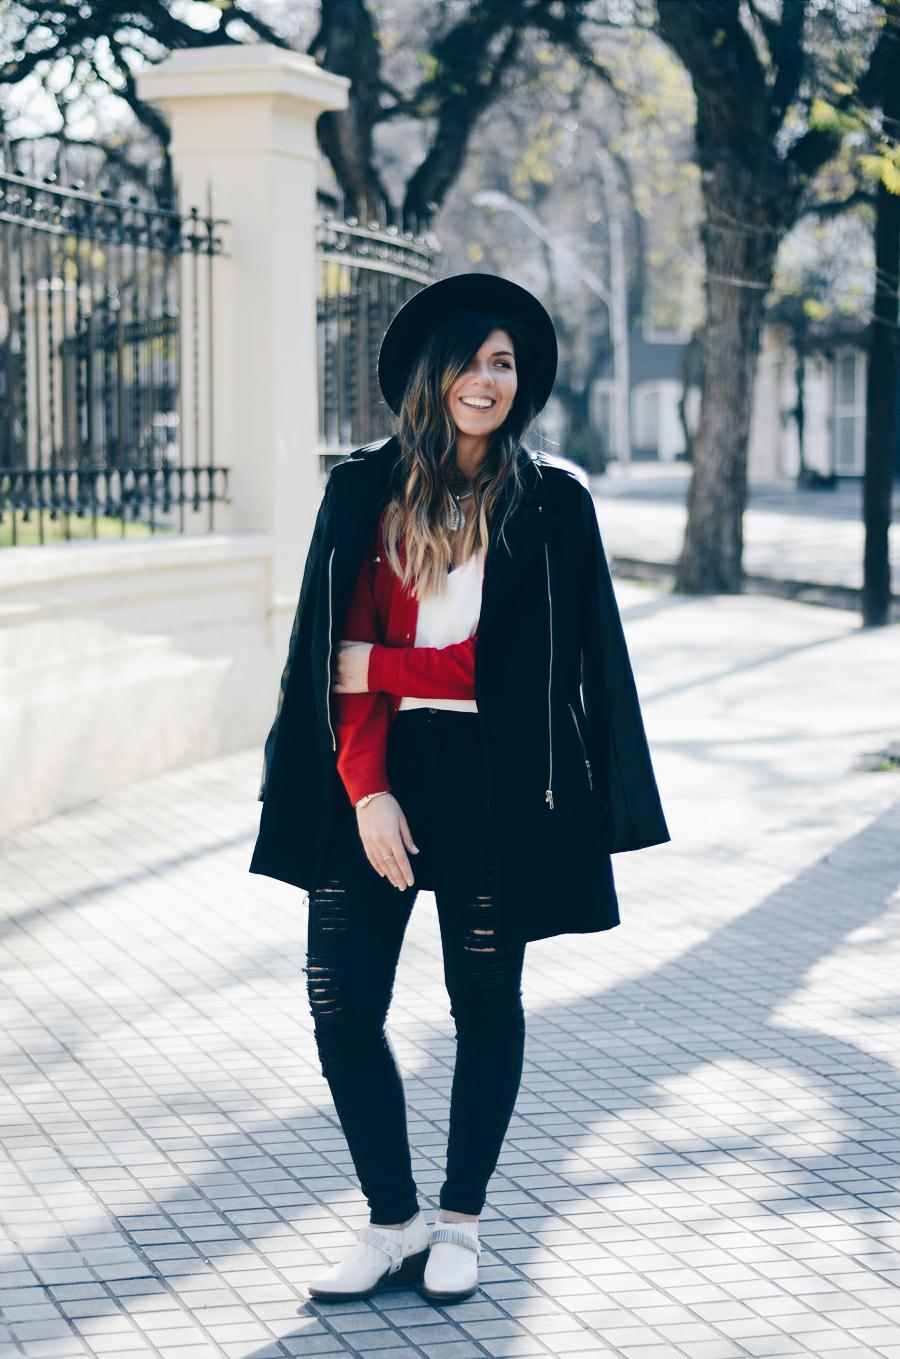 Cómo usar zapatos blancos | Cassandra Valdes